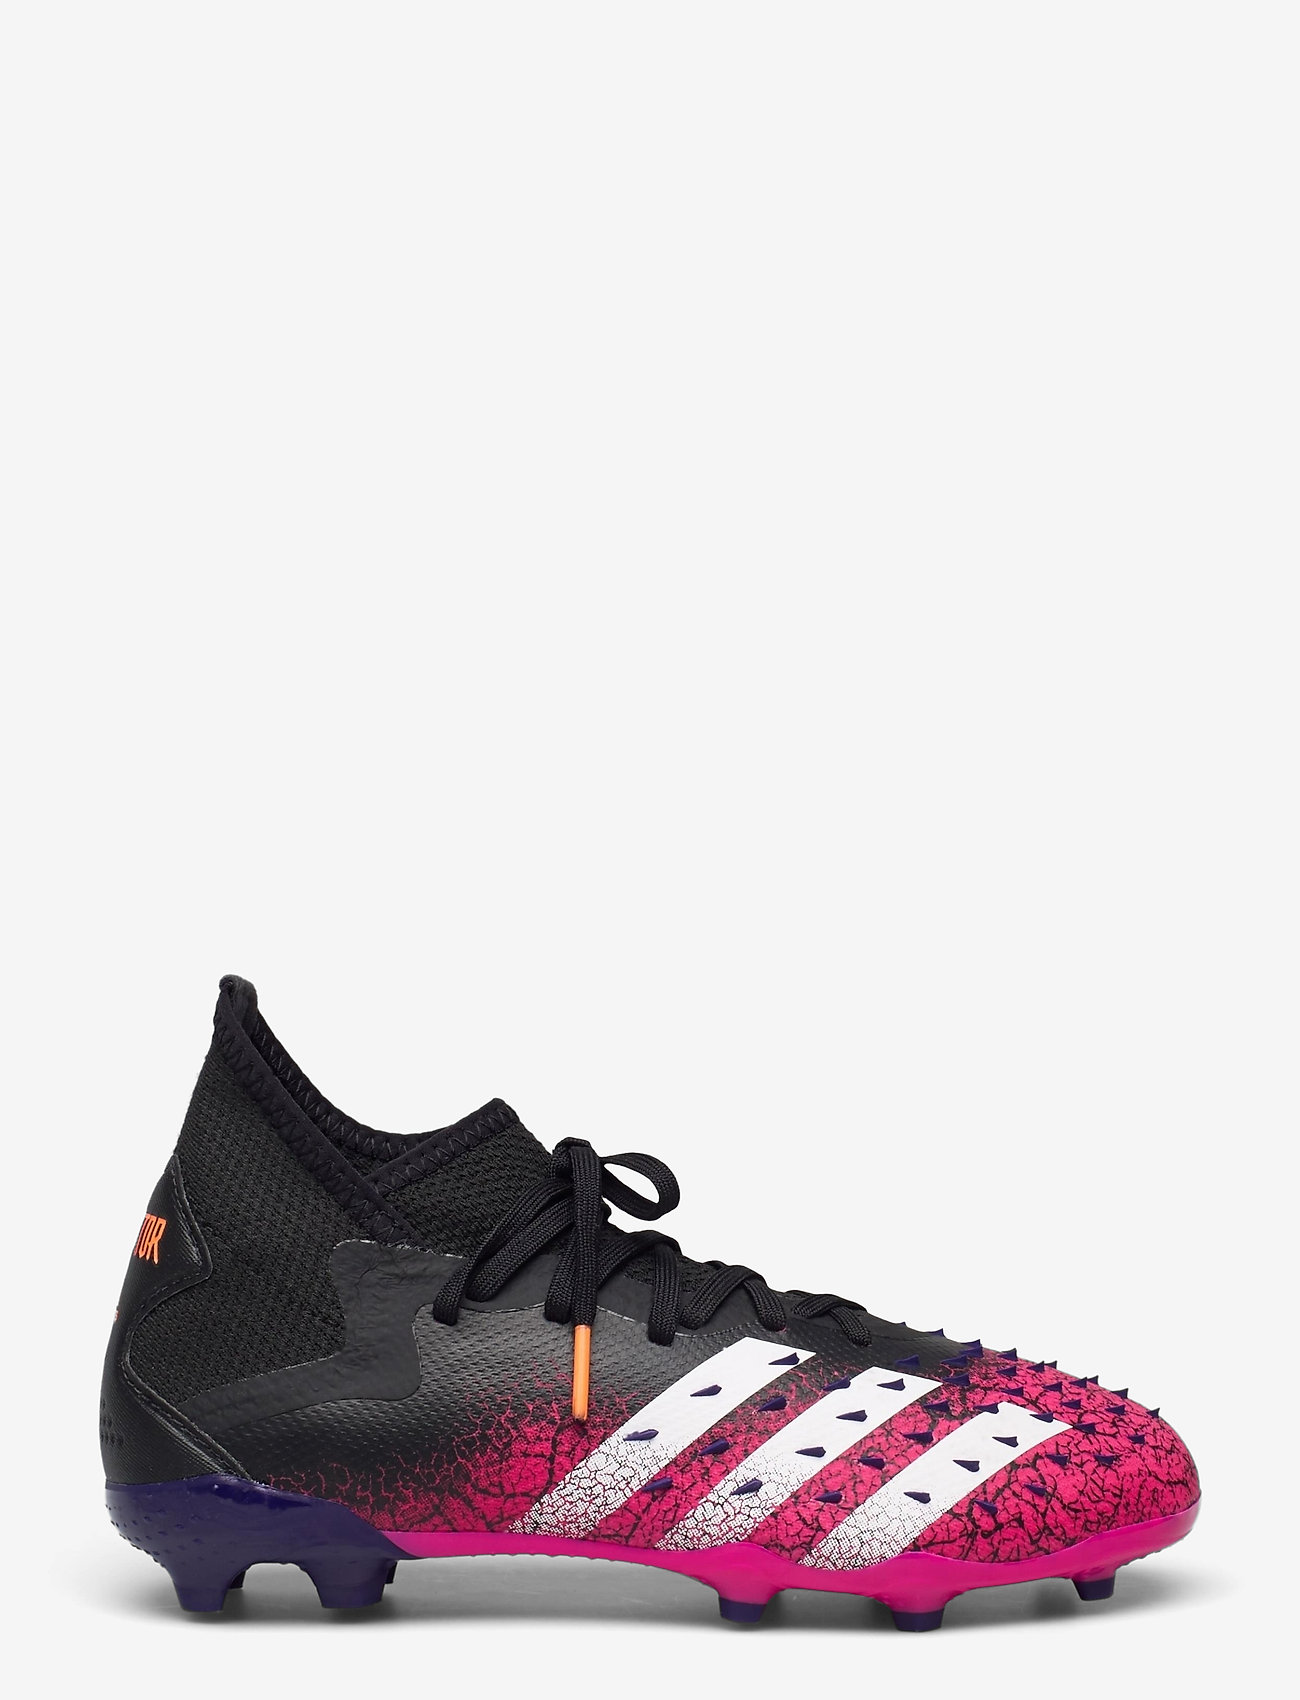 adidas Performance - PREDATOR FREAK .2 FG - fotballsko - cblack/ftwwht/shopnk - 1